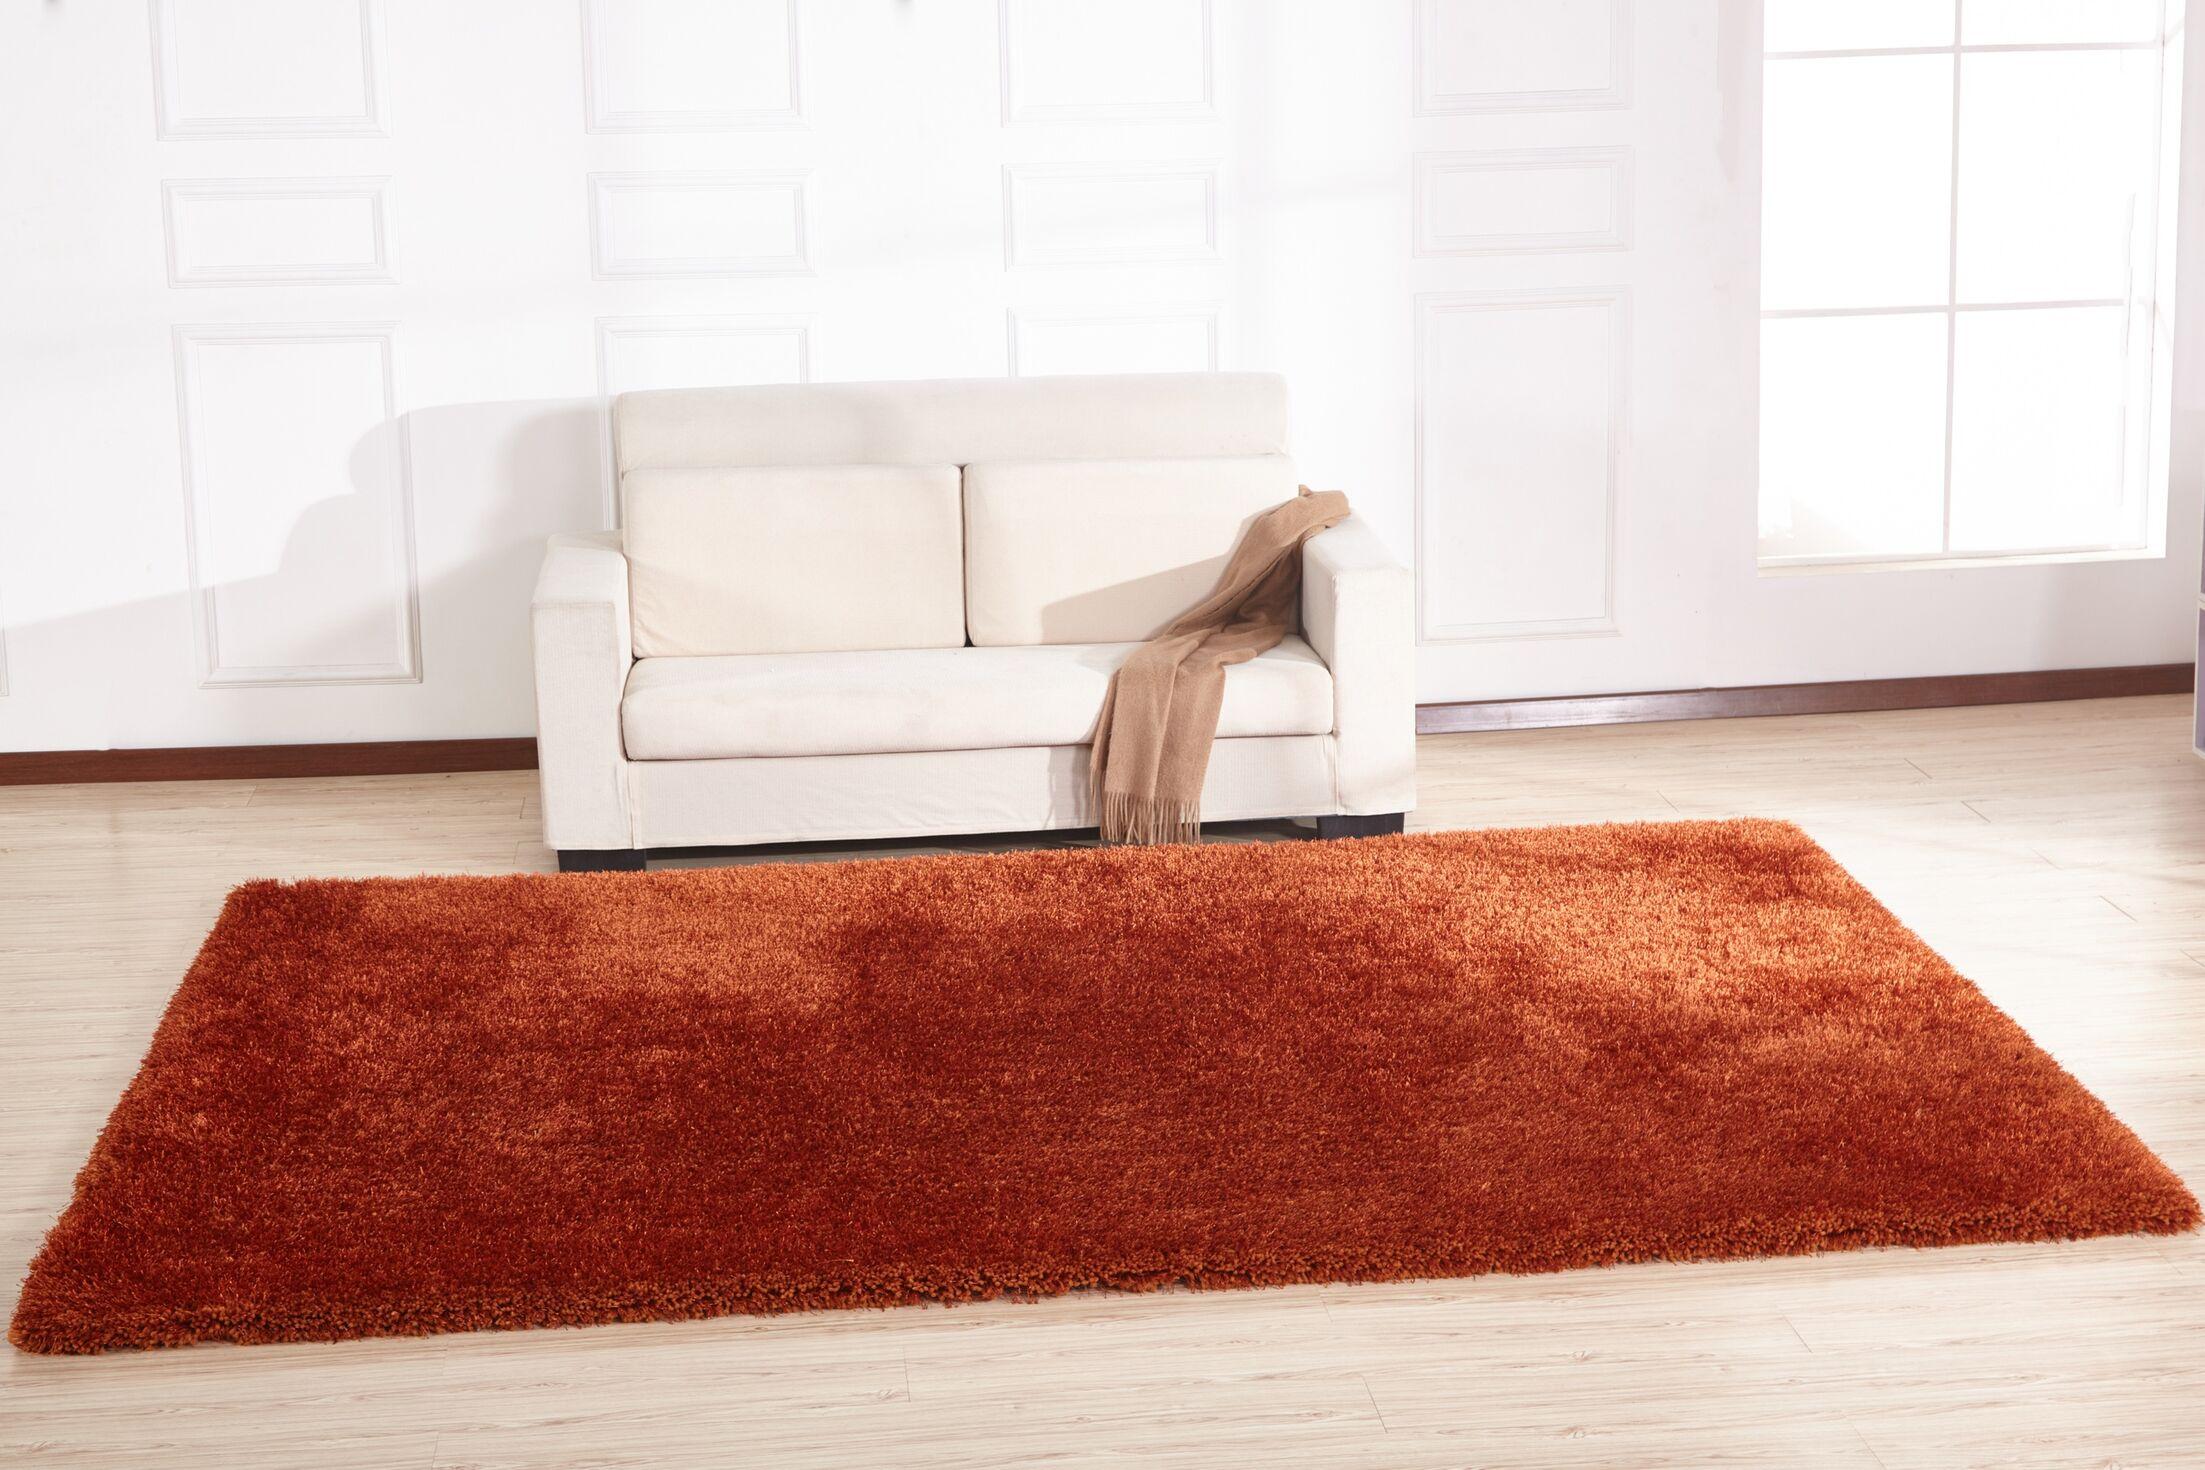 Heineman Solid Shag Hand-Tufted Orange Area Rug Rug Size: Rectangle 7'6